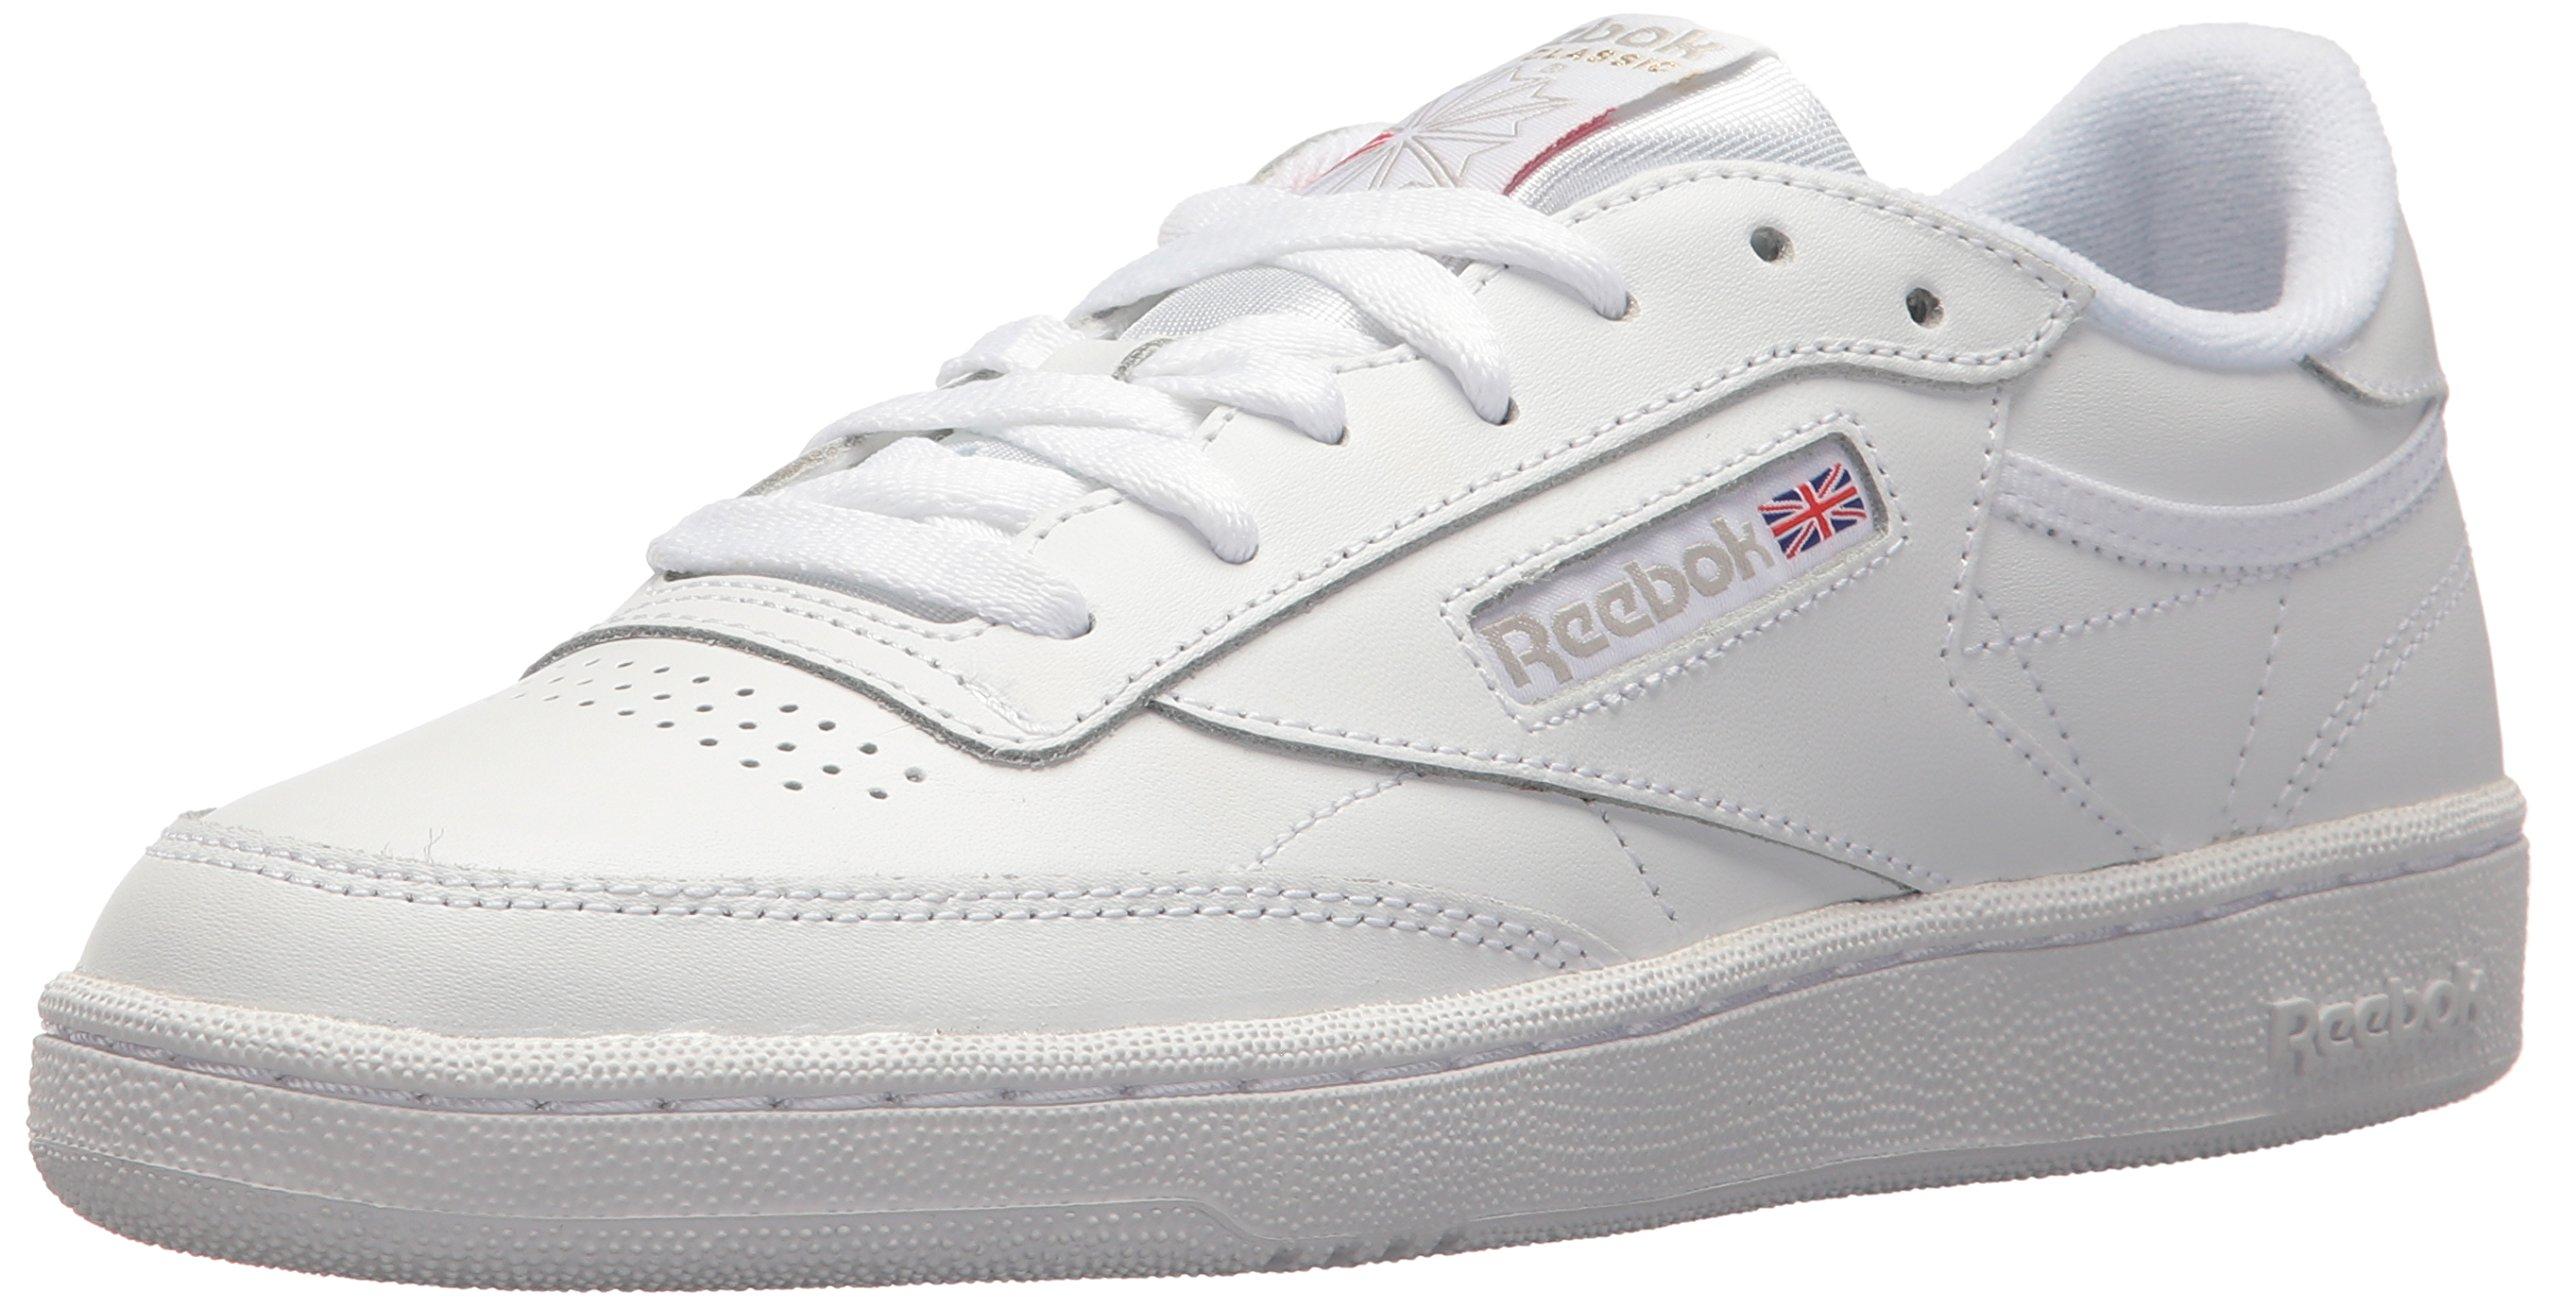 Reebok Women's Club C 85 Walking Shoe, White/Light Grey, 7 M US